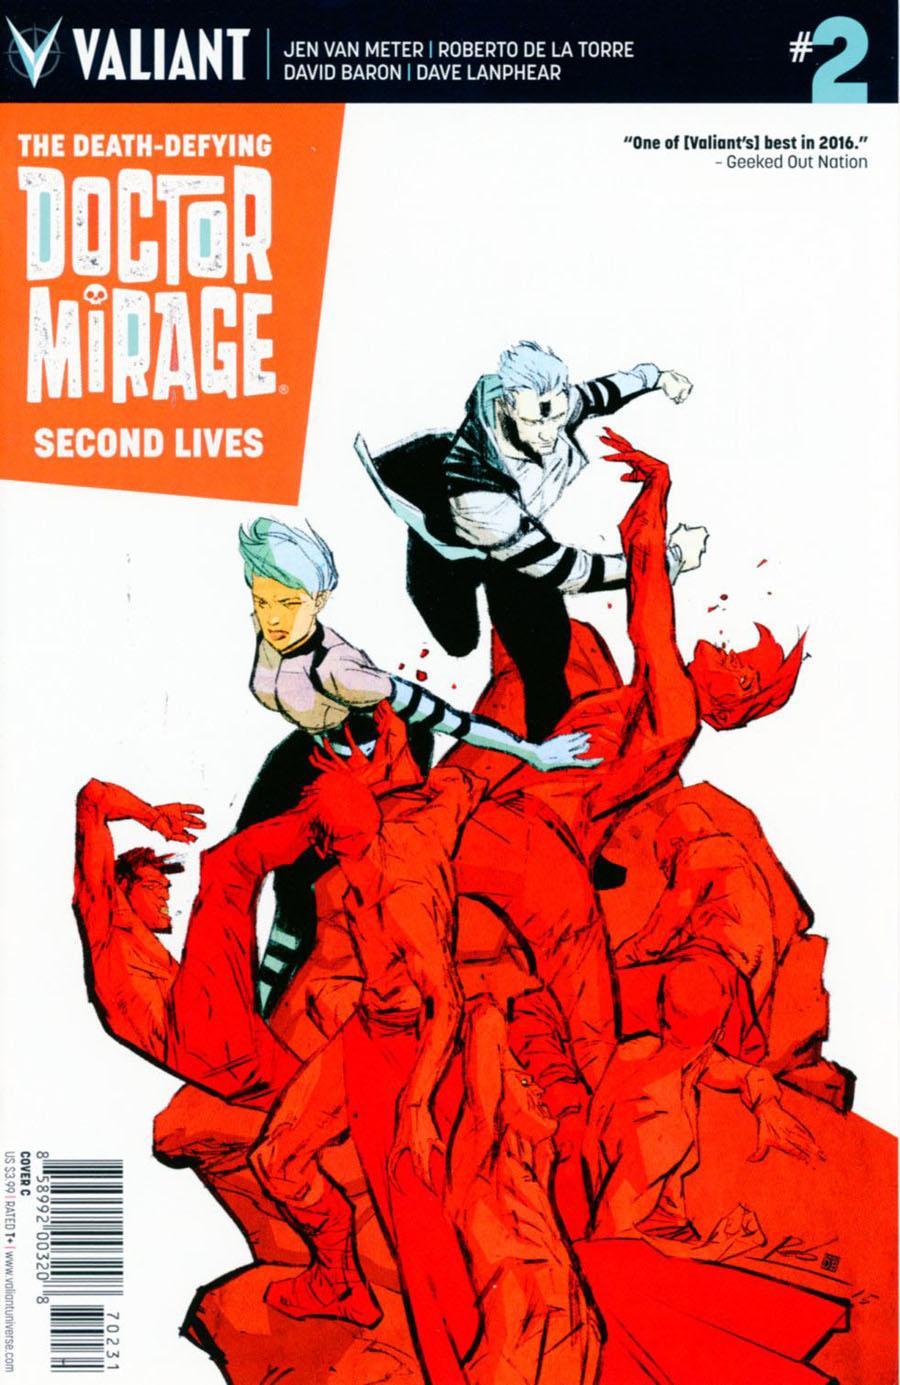 Death-Defying Doctor Mirage Second Lives #2 Cover C Variant Roberto De La Torre Cover